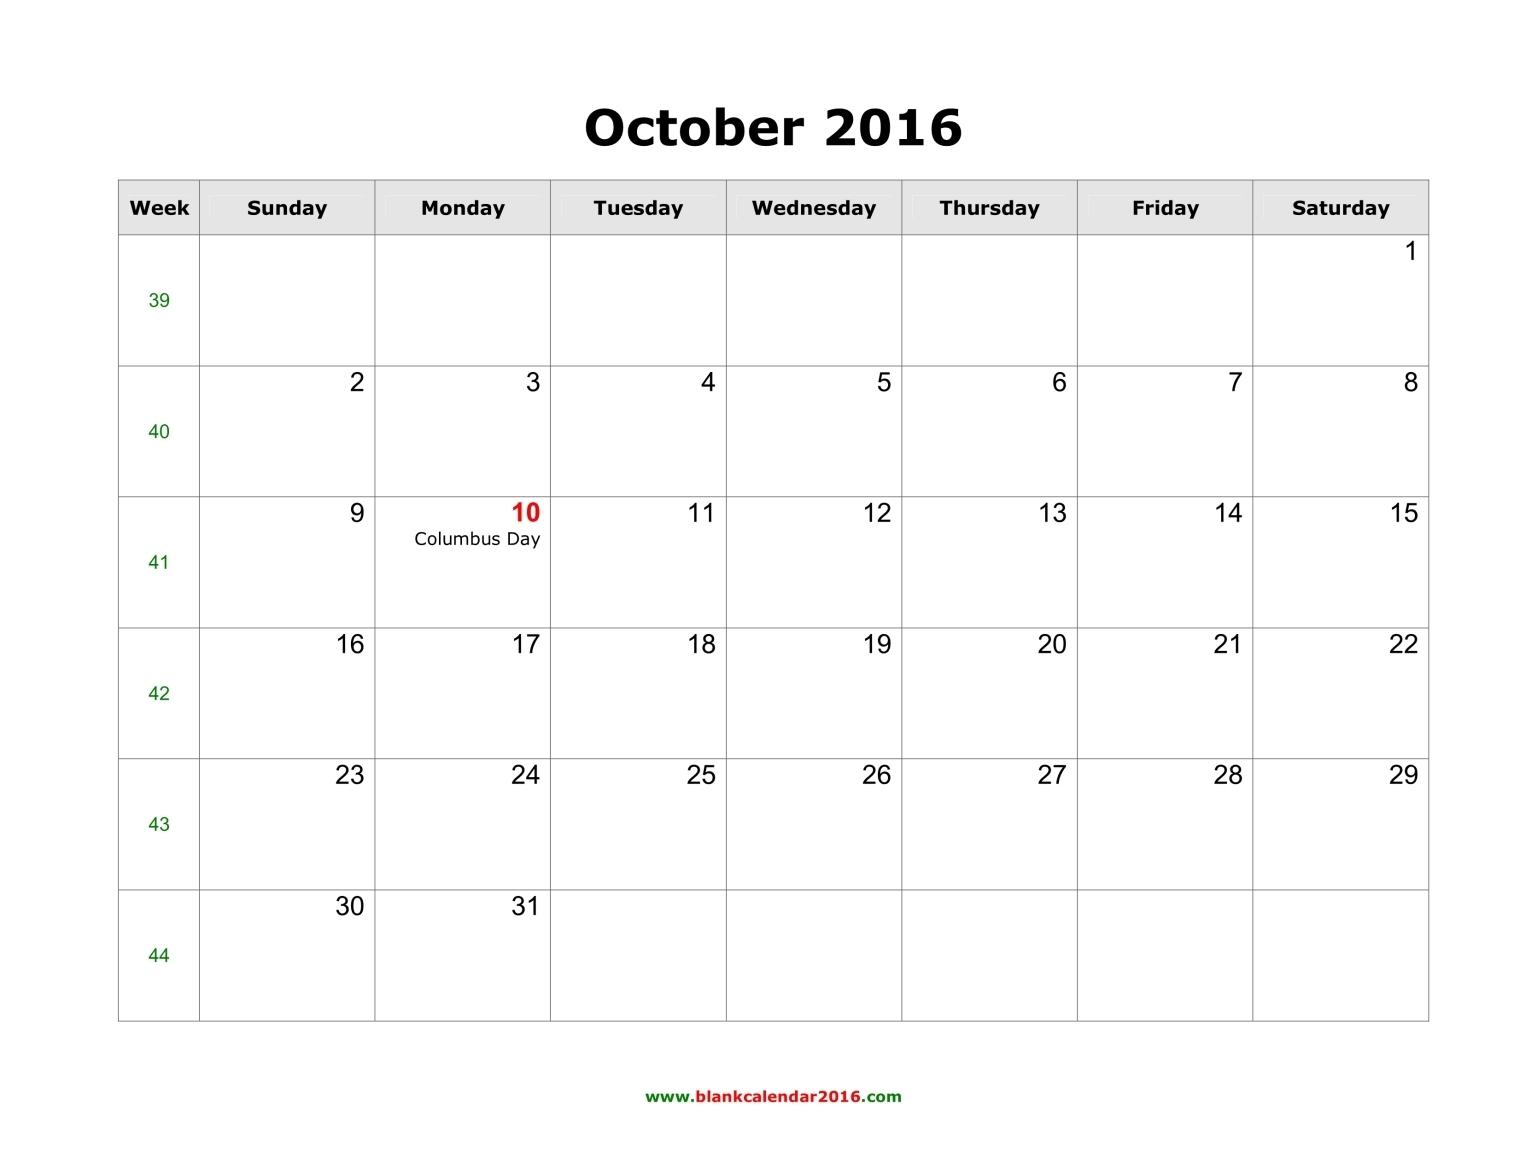 Blank Calendar for October 2016